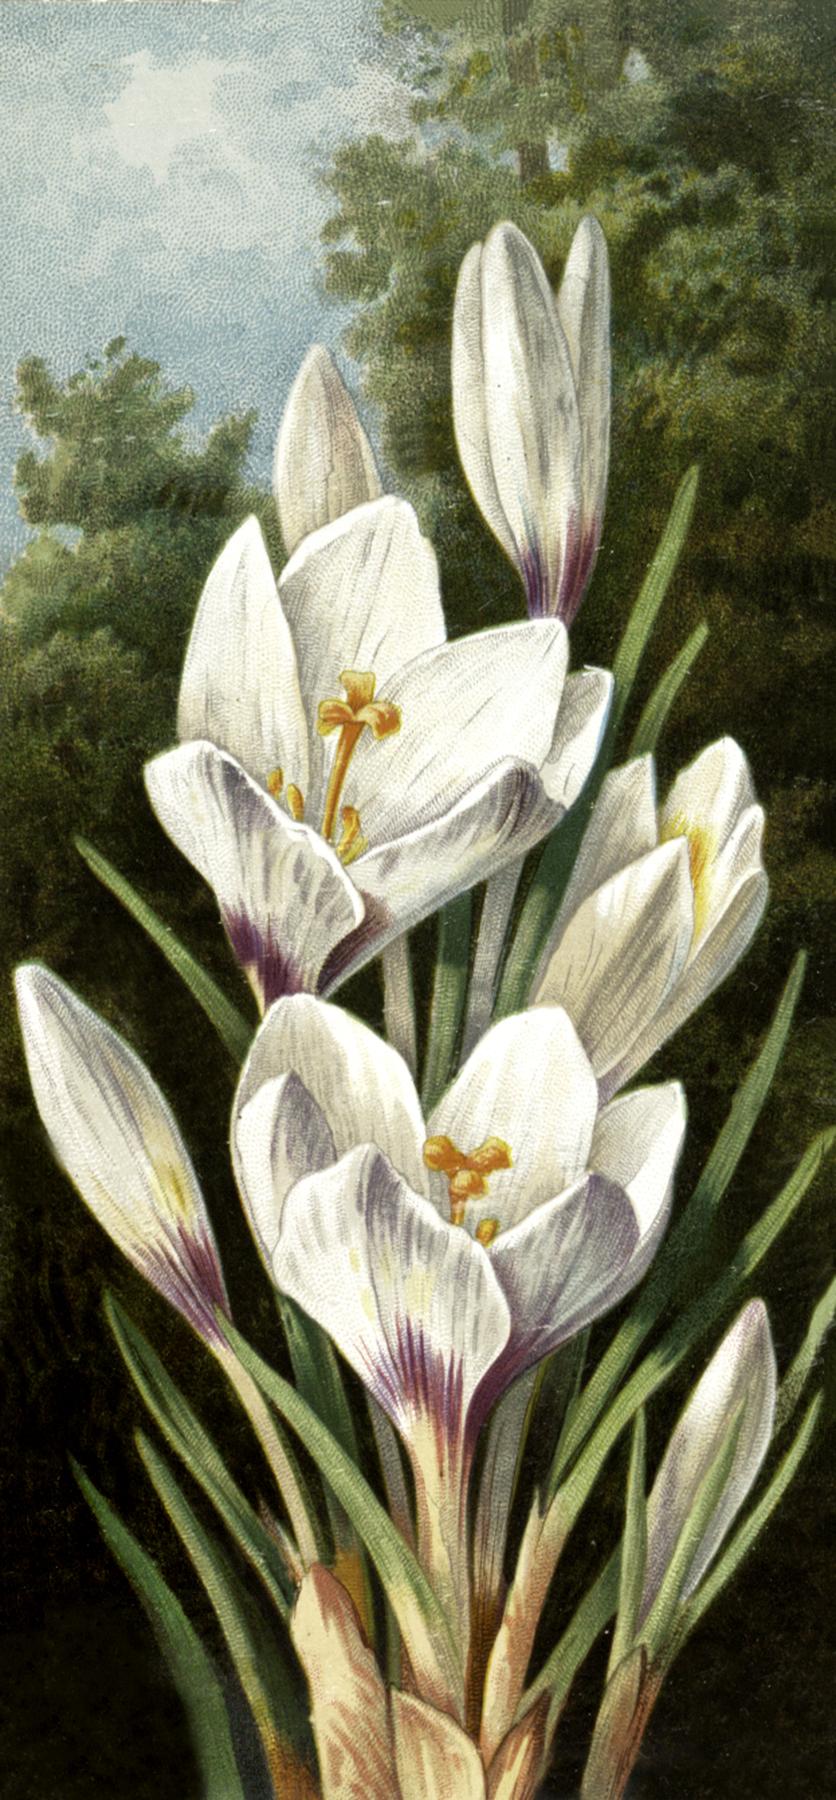 Beautiful White and Purple Lily Image